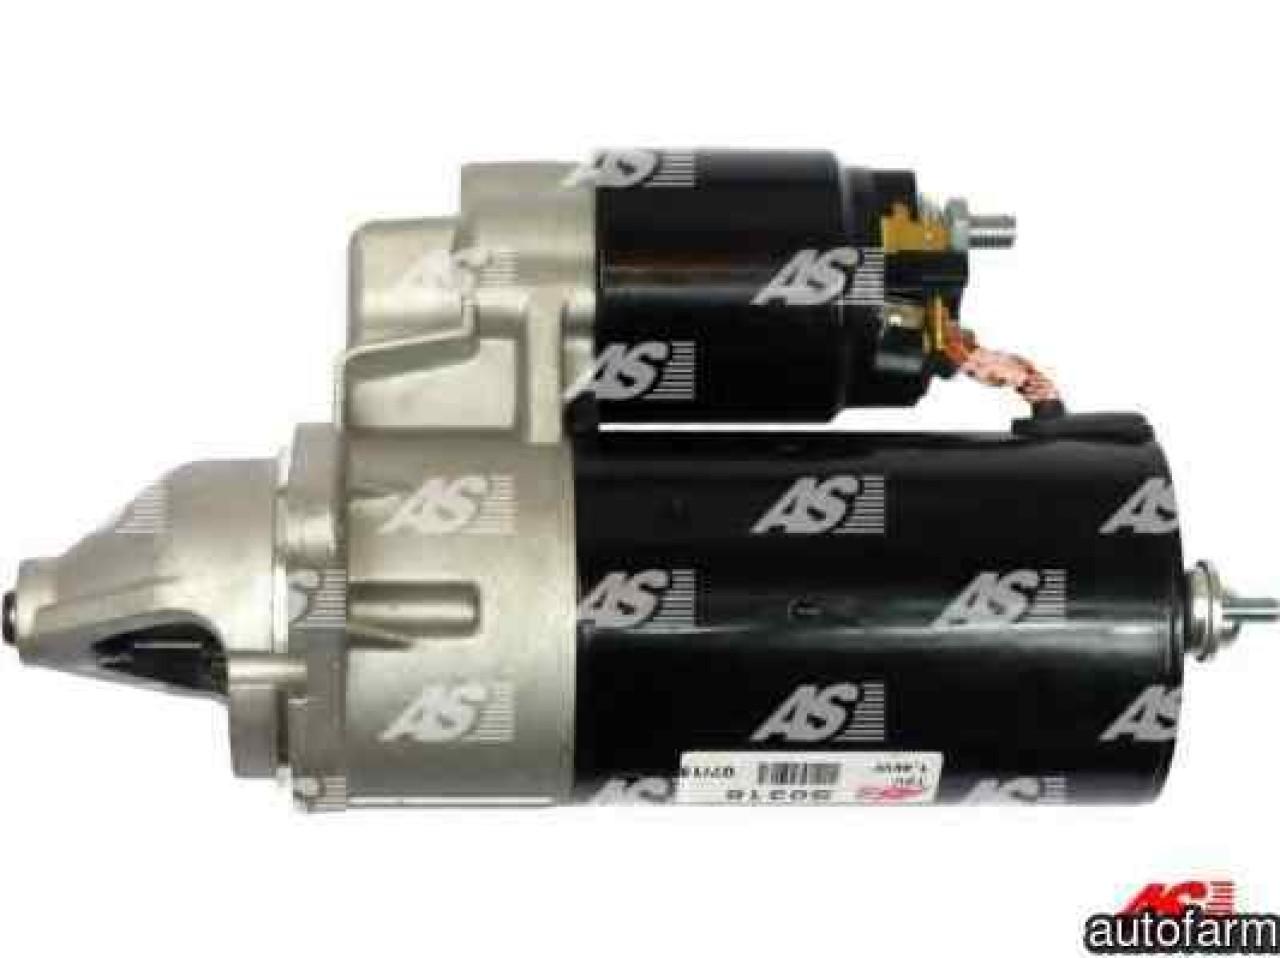 Electromotor OPEL ASTRA F hatchback 53 54 58 59 AS-PL S0318